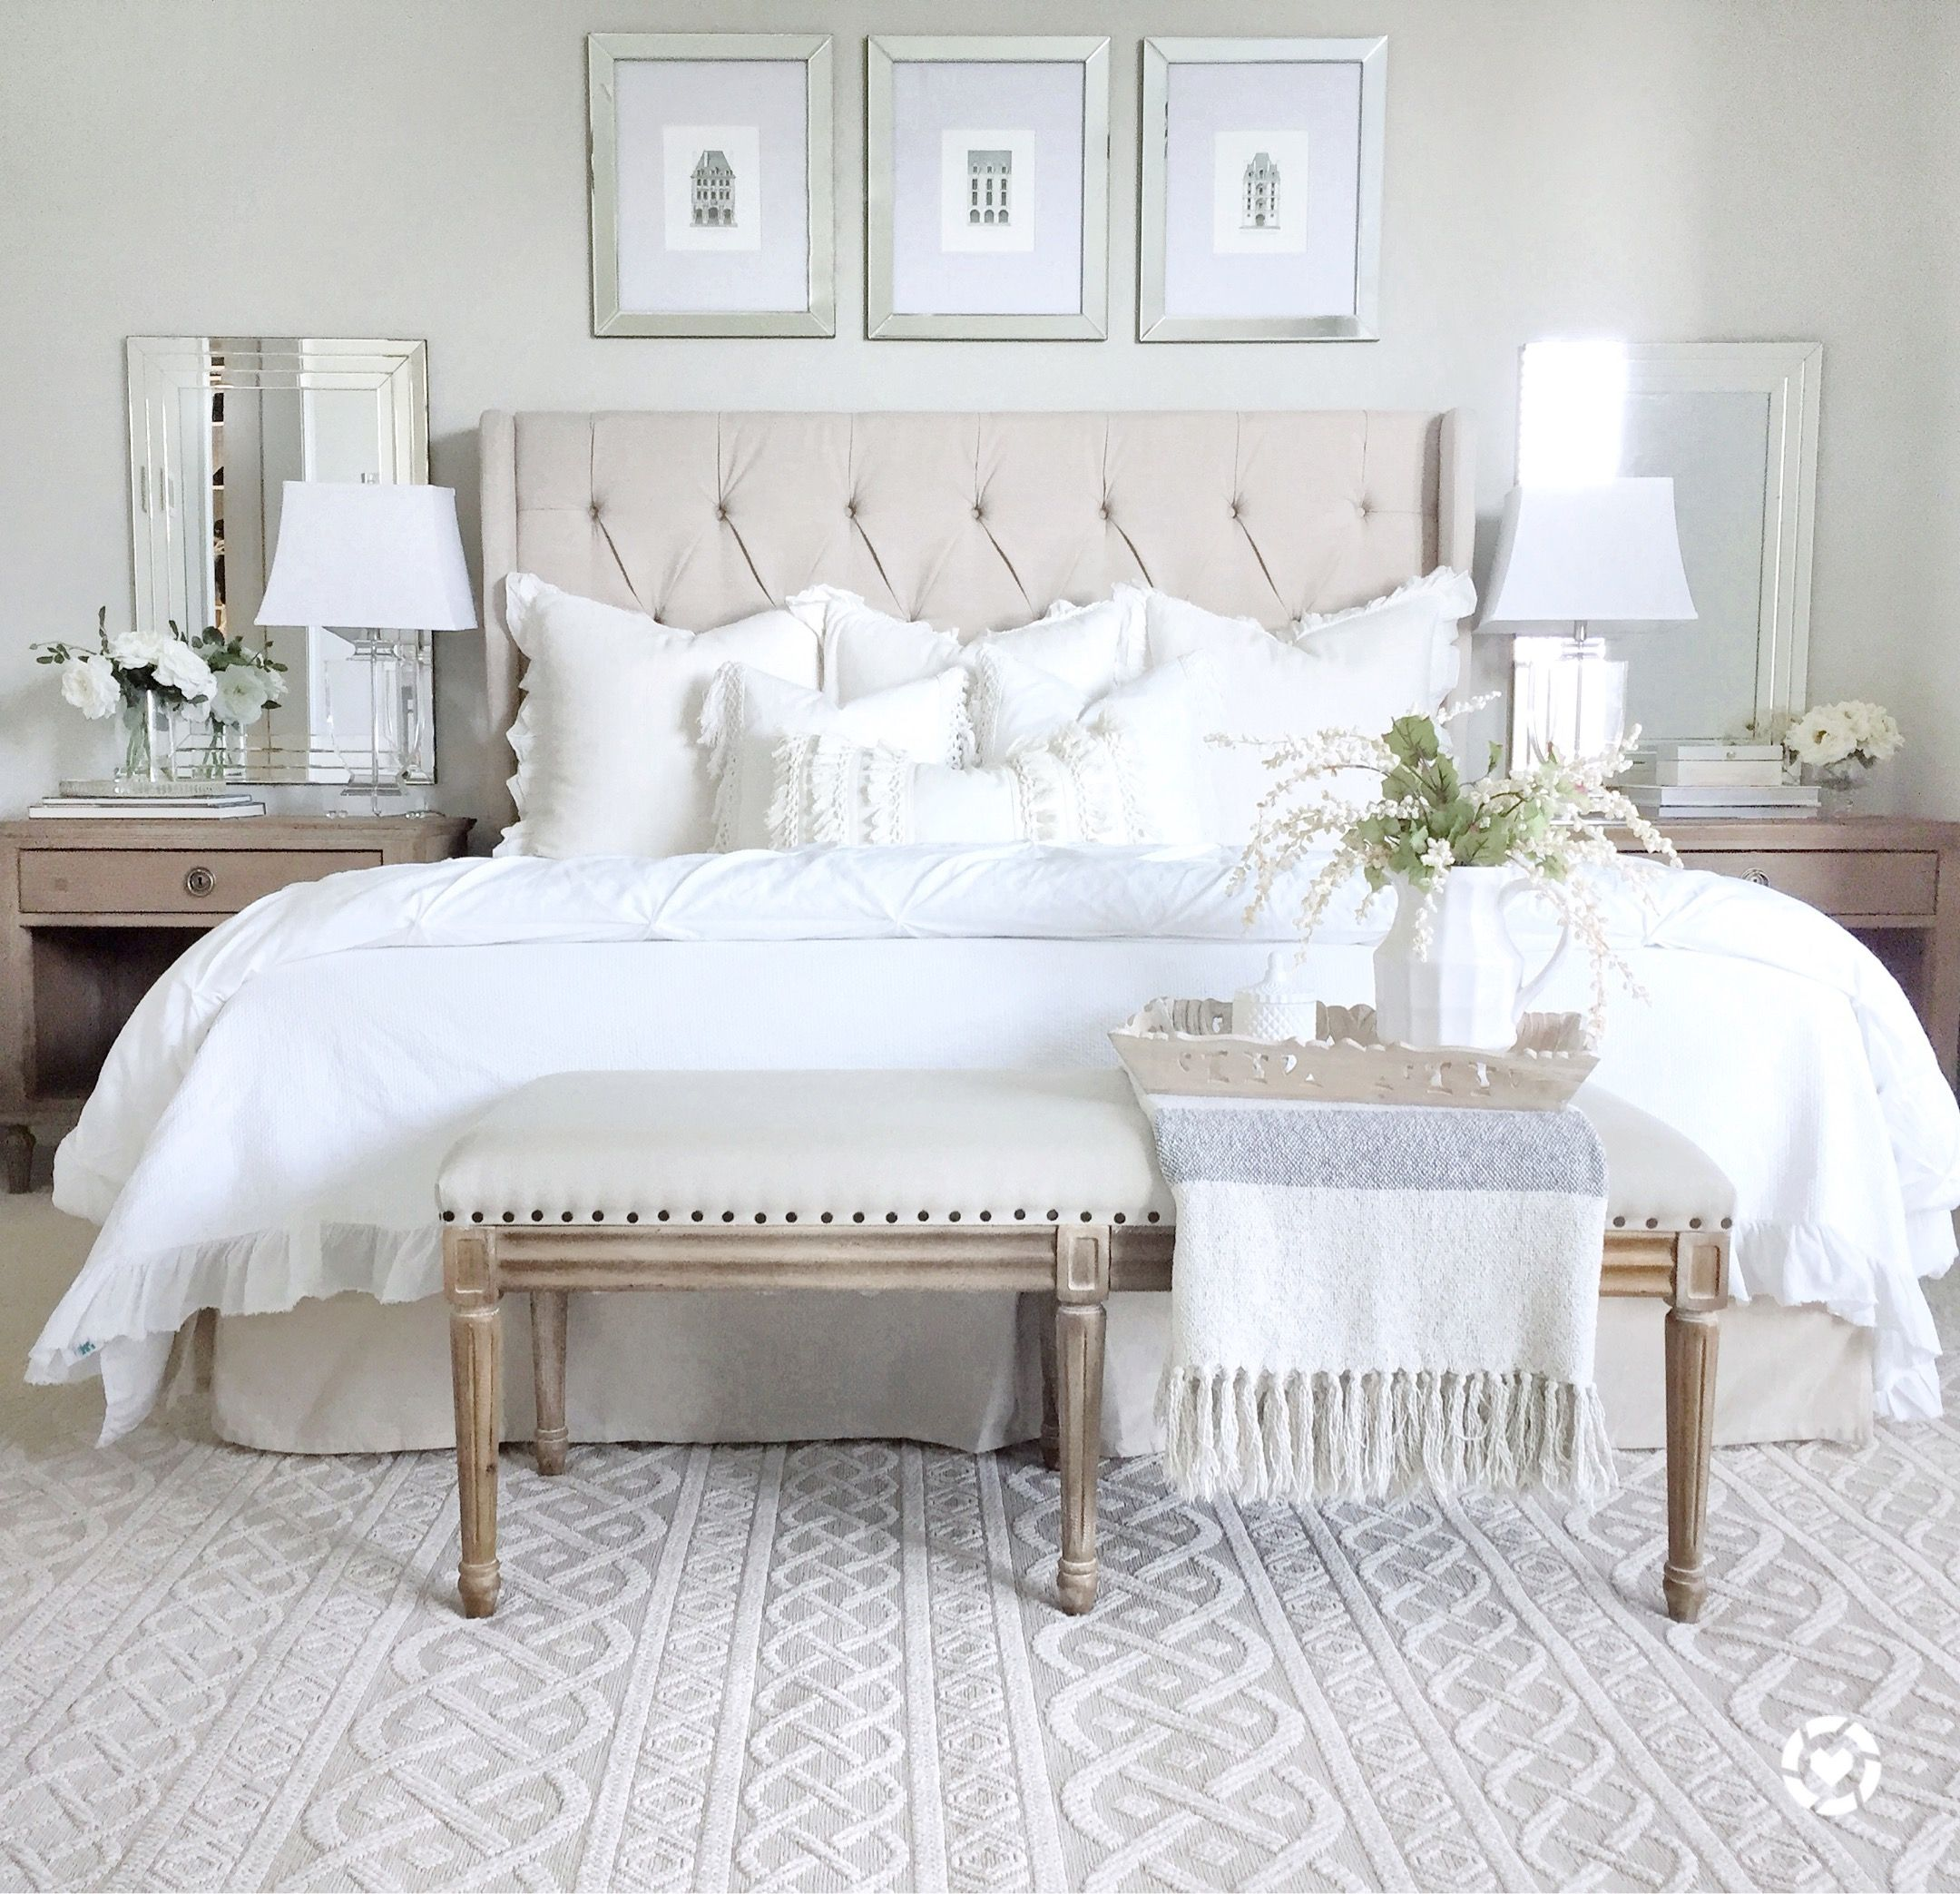 White master bedroom decor  Neutral bedroom decor  Bedroom  Pinterest  Bedrooms Modern